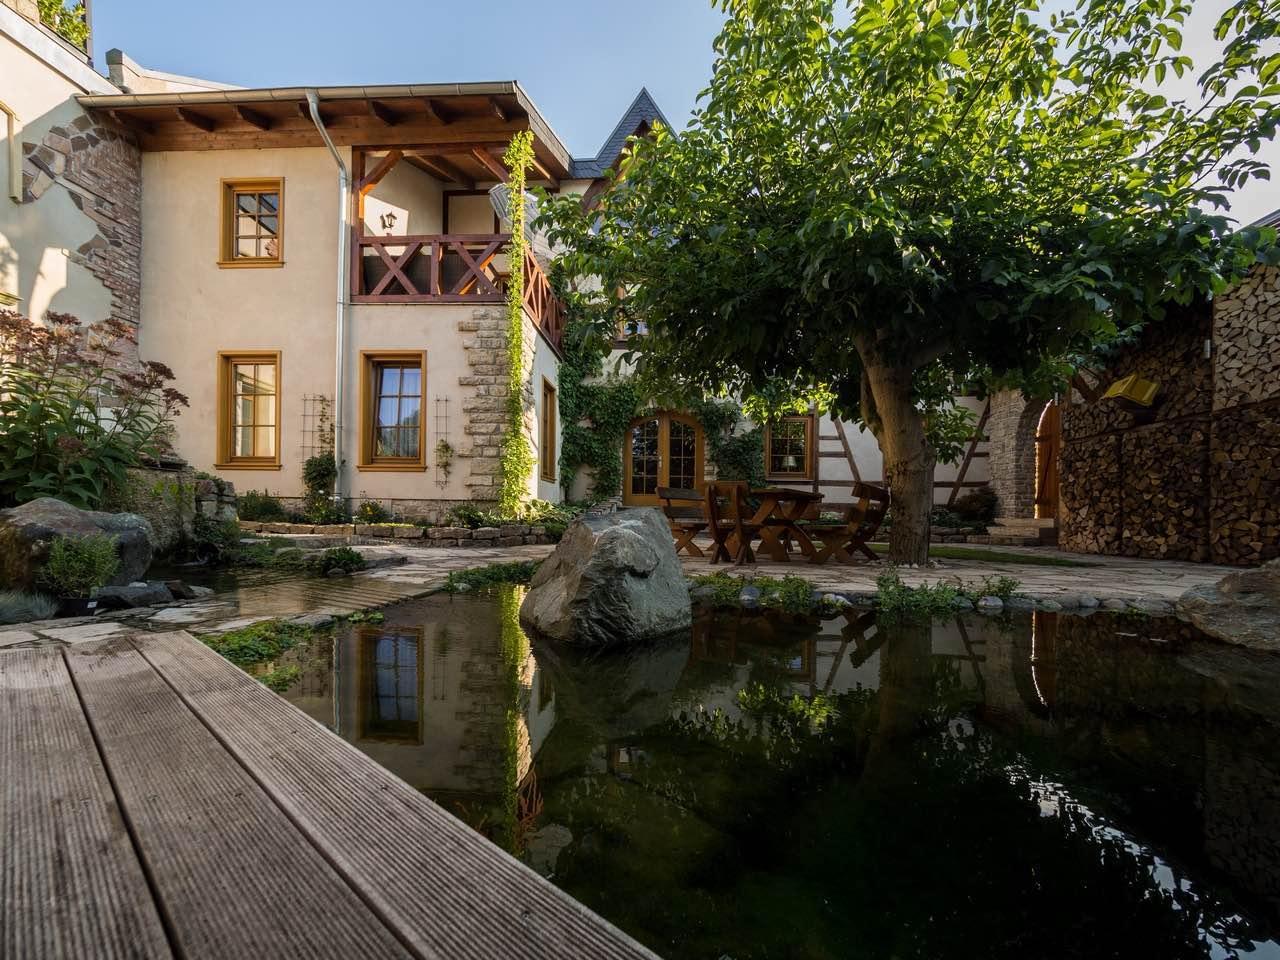 Garten (Teich)